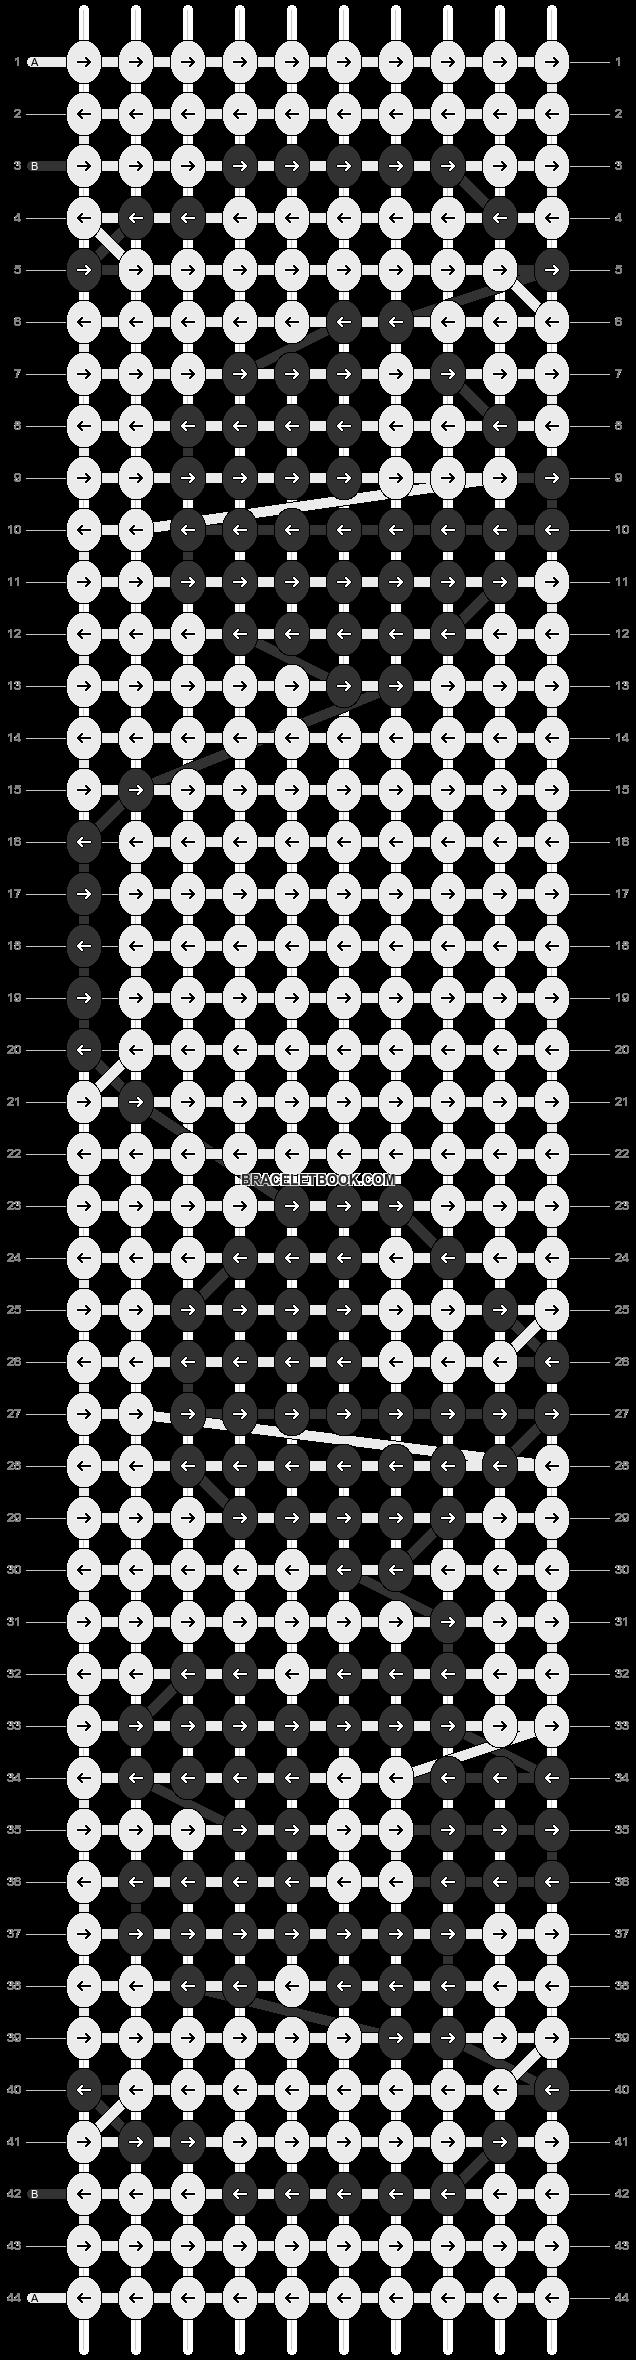 Alpha Pattern #18825 added by petulinda